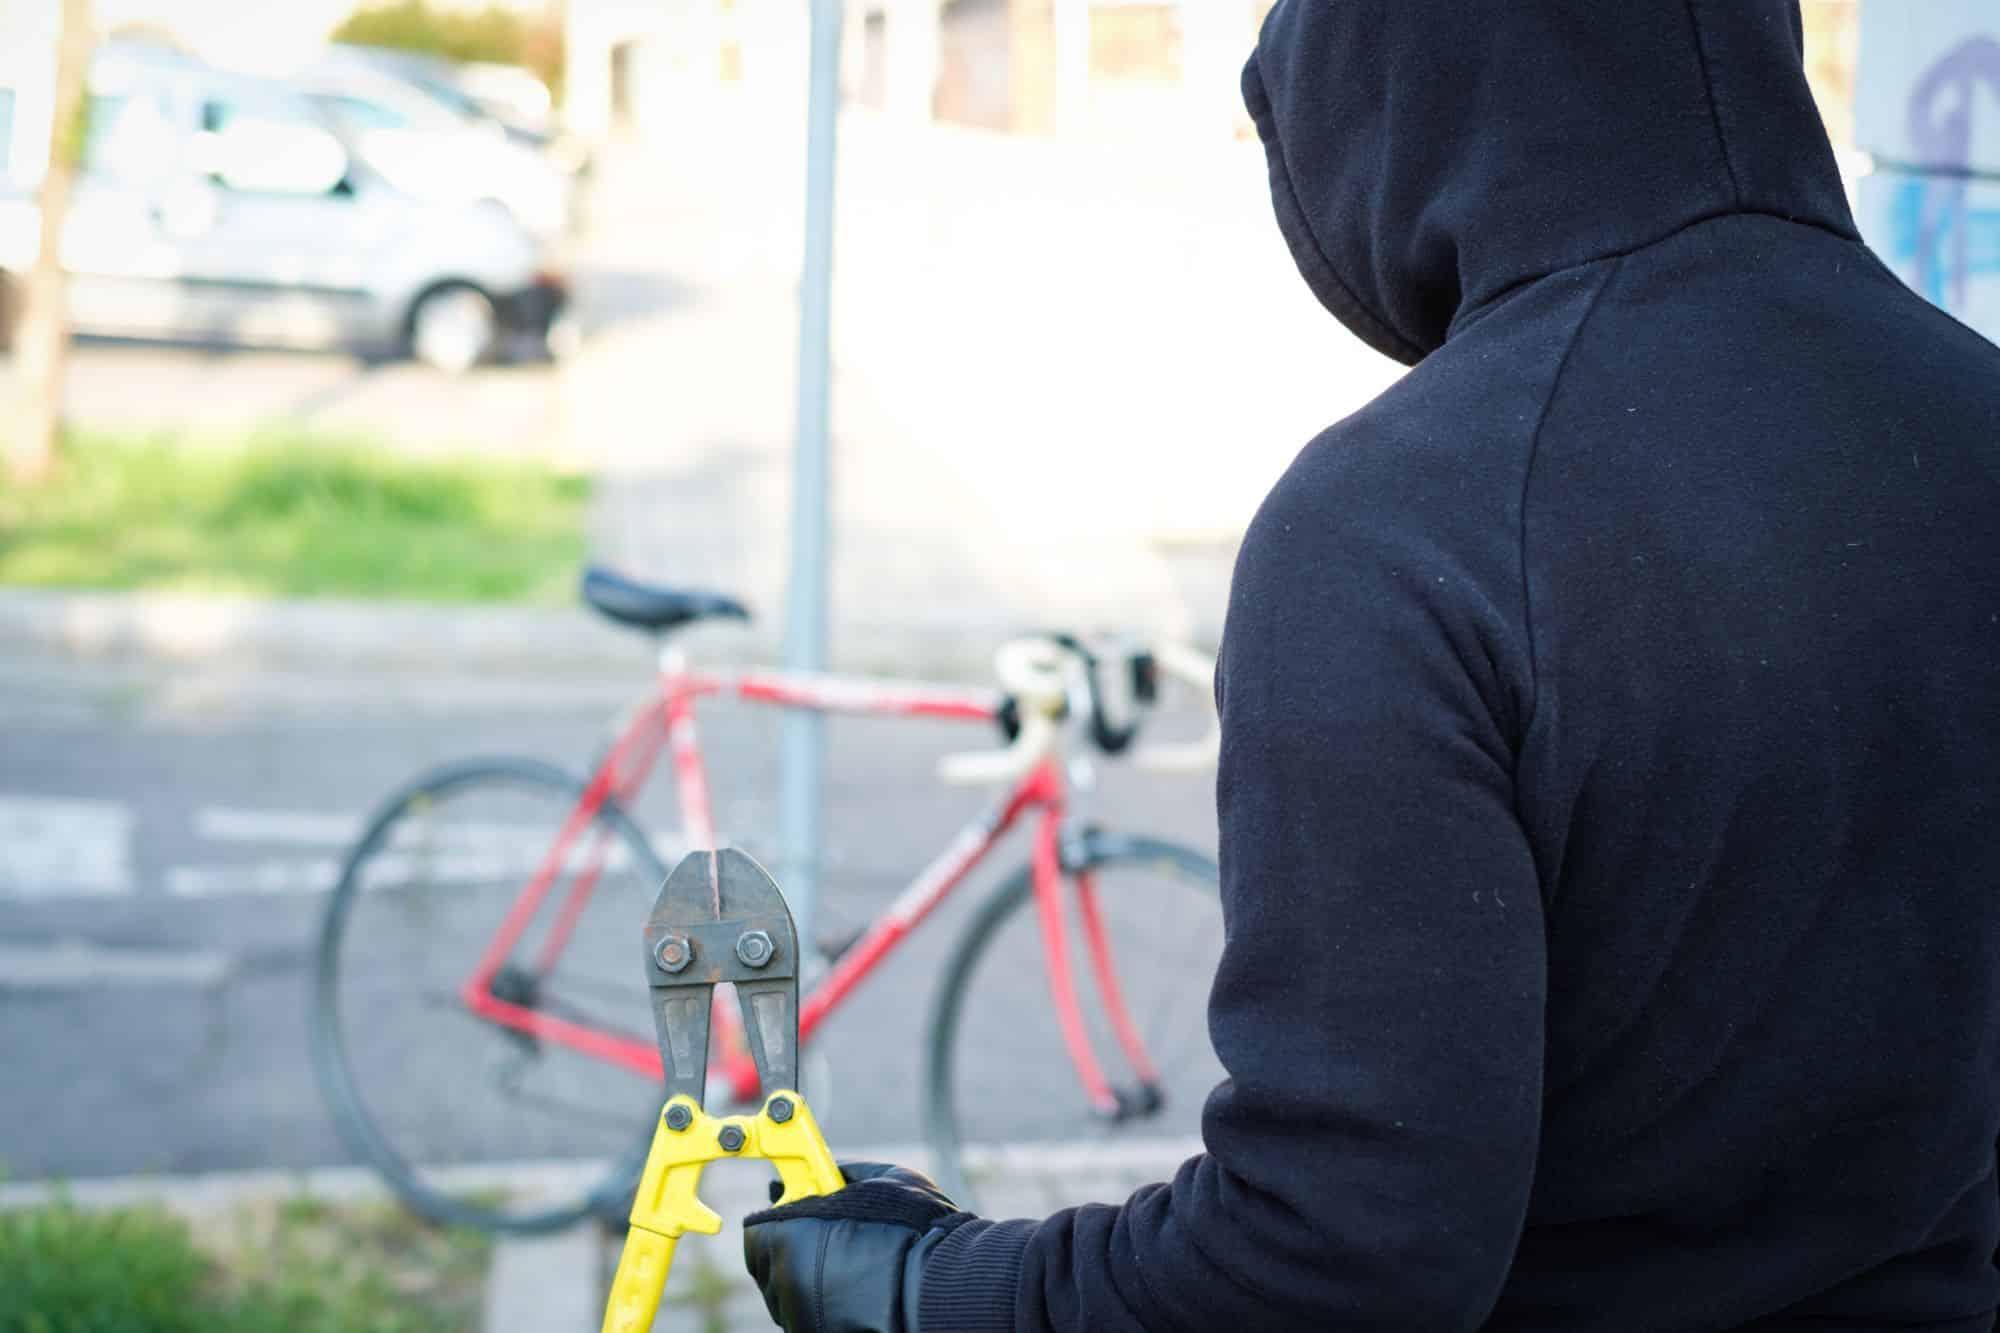 Bike lock test 2021 - really secure bike locks in the overview